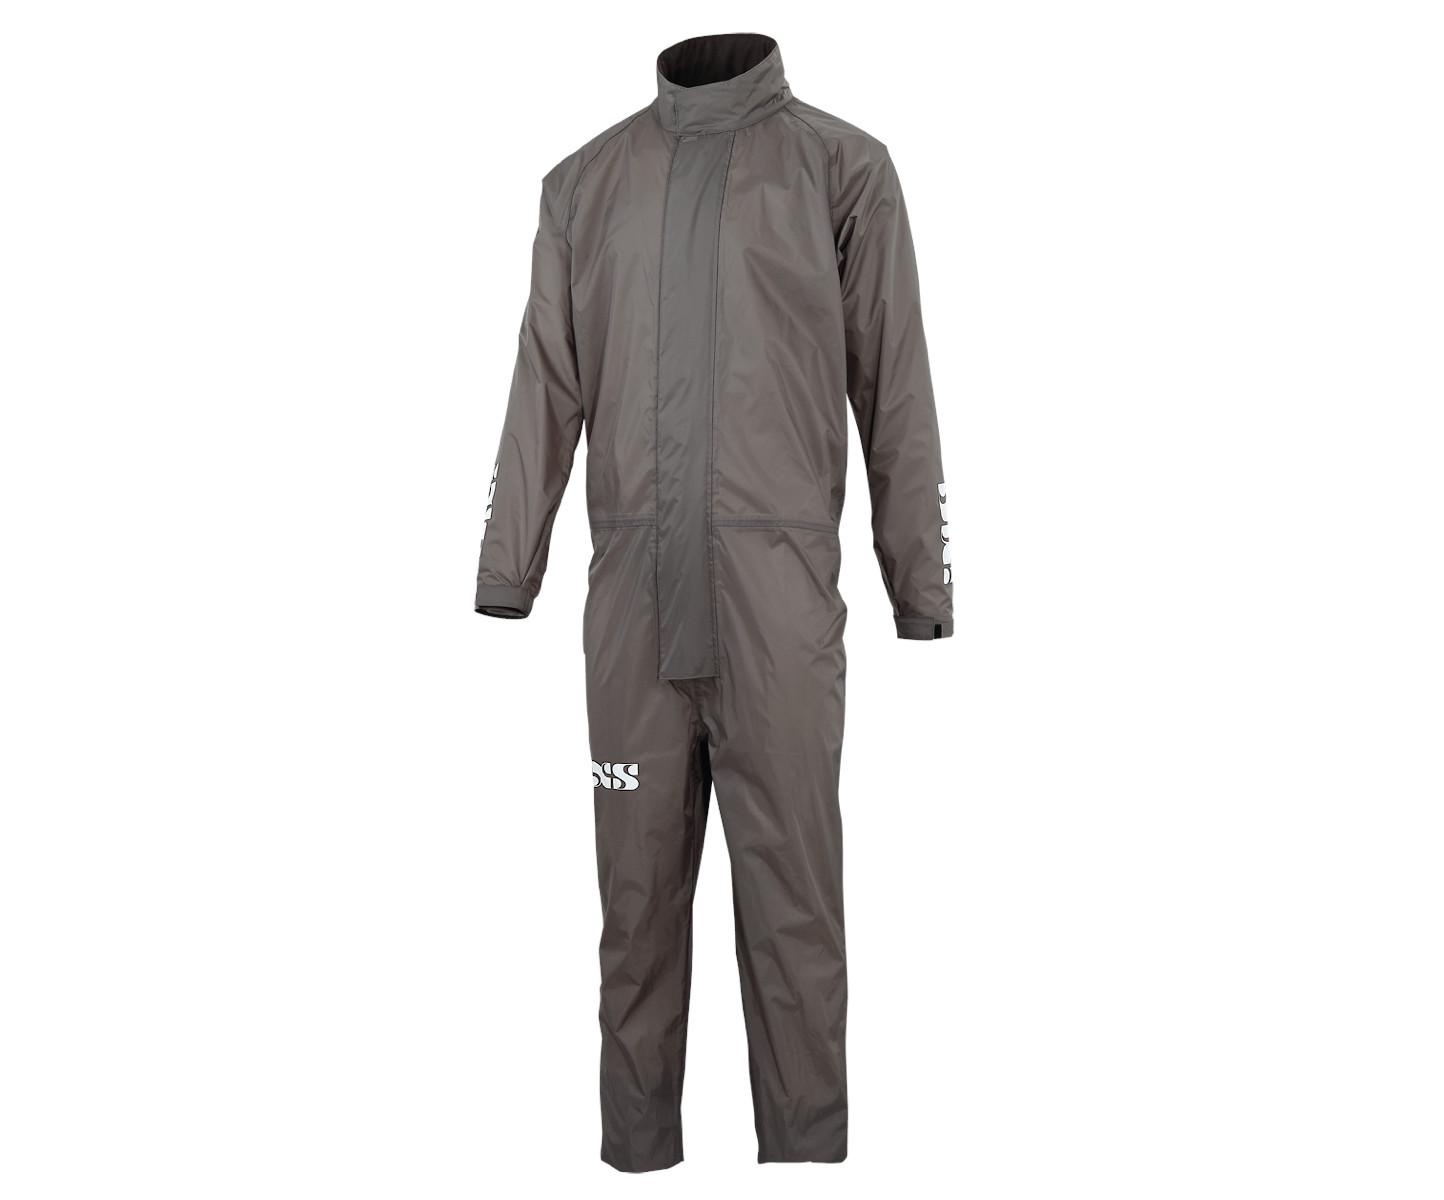 iXS Rain Suit Overall